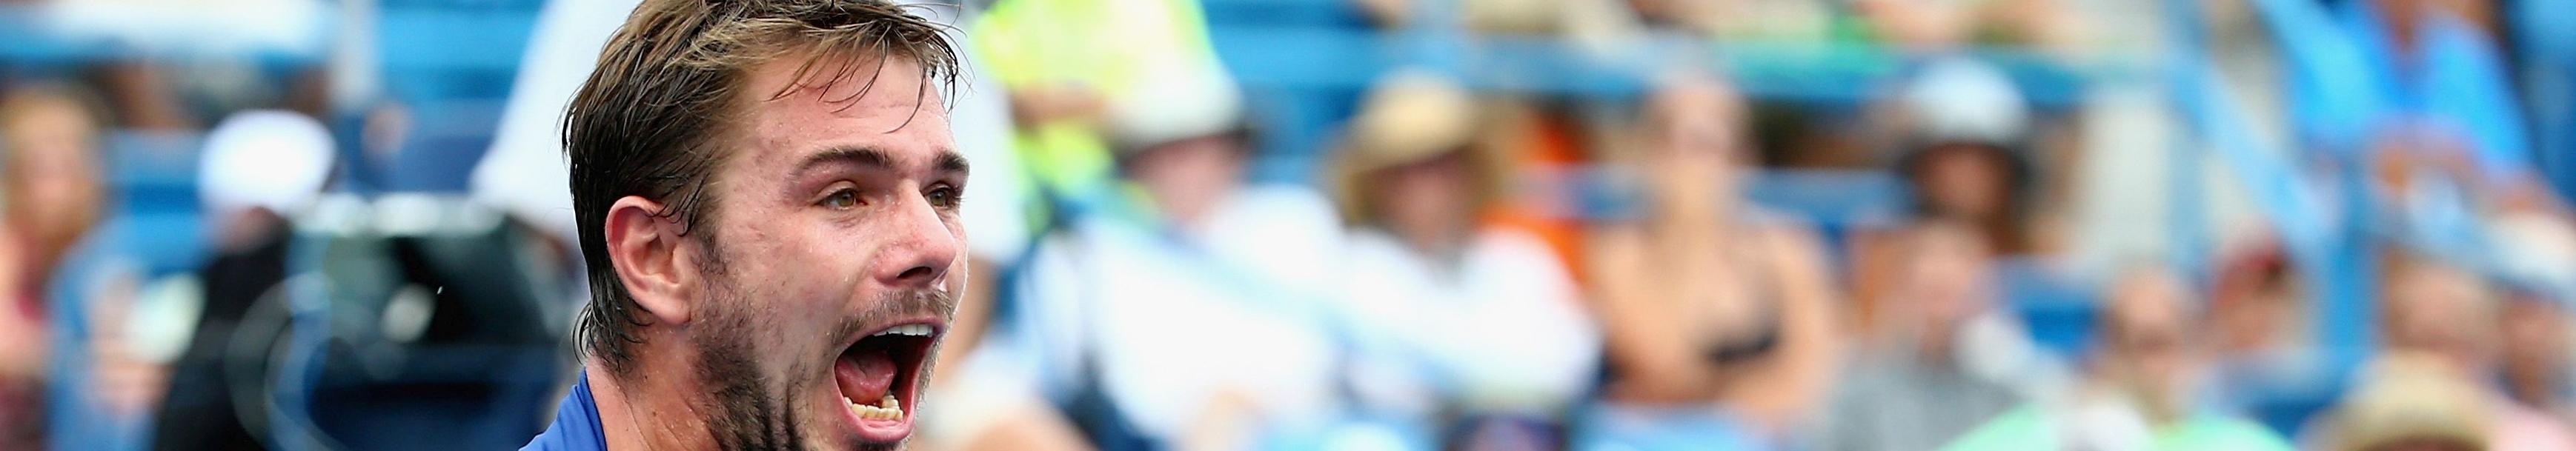 US Open, day 7: Djokovic al test Wawrinka, Federer